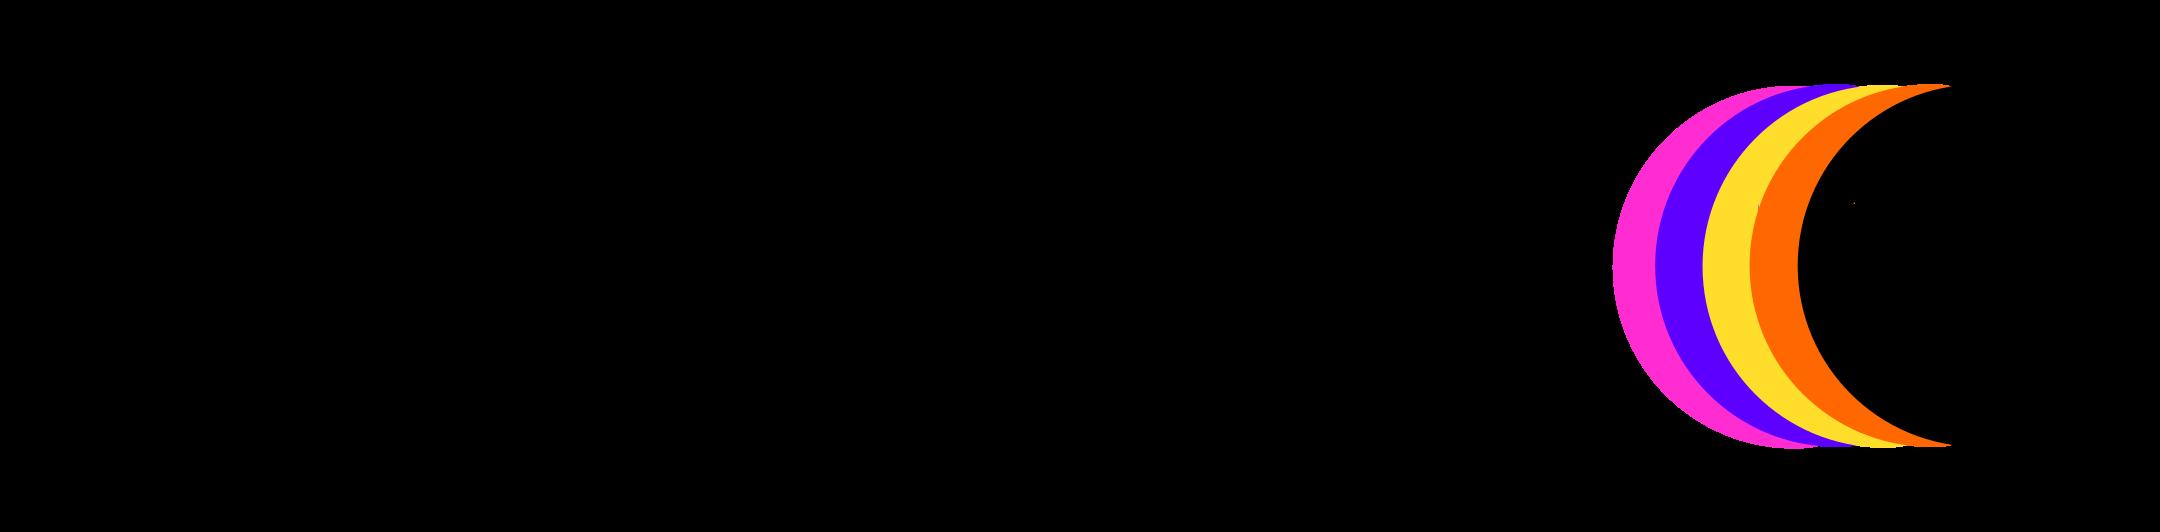 pluto tv logo 1 - Pluto TV Logo